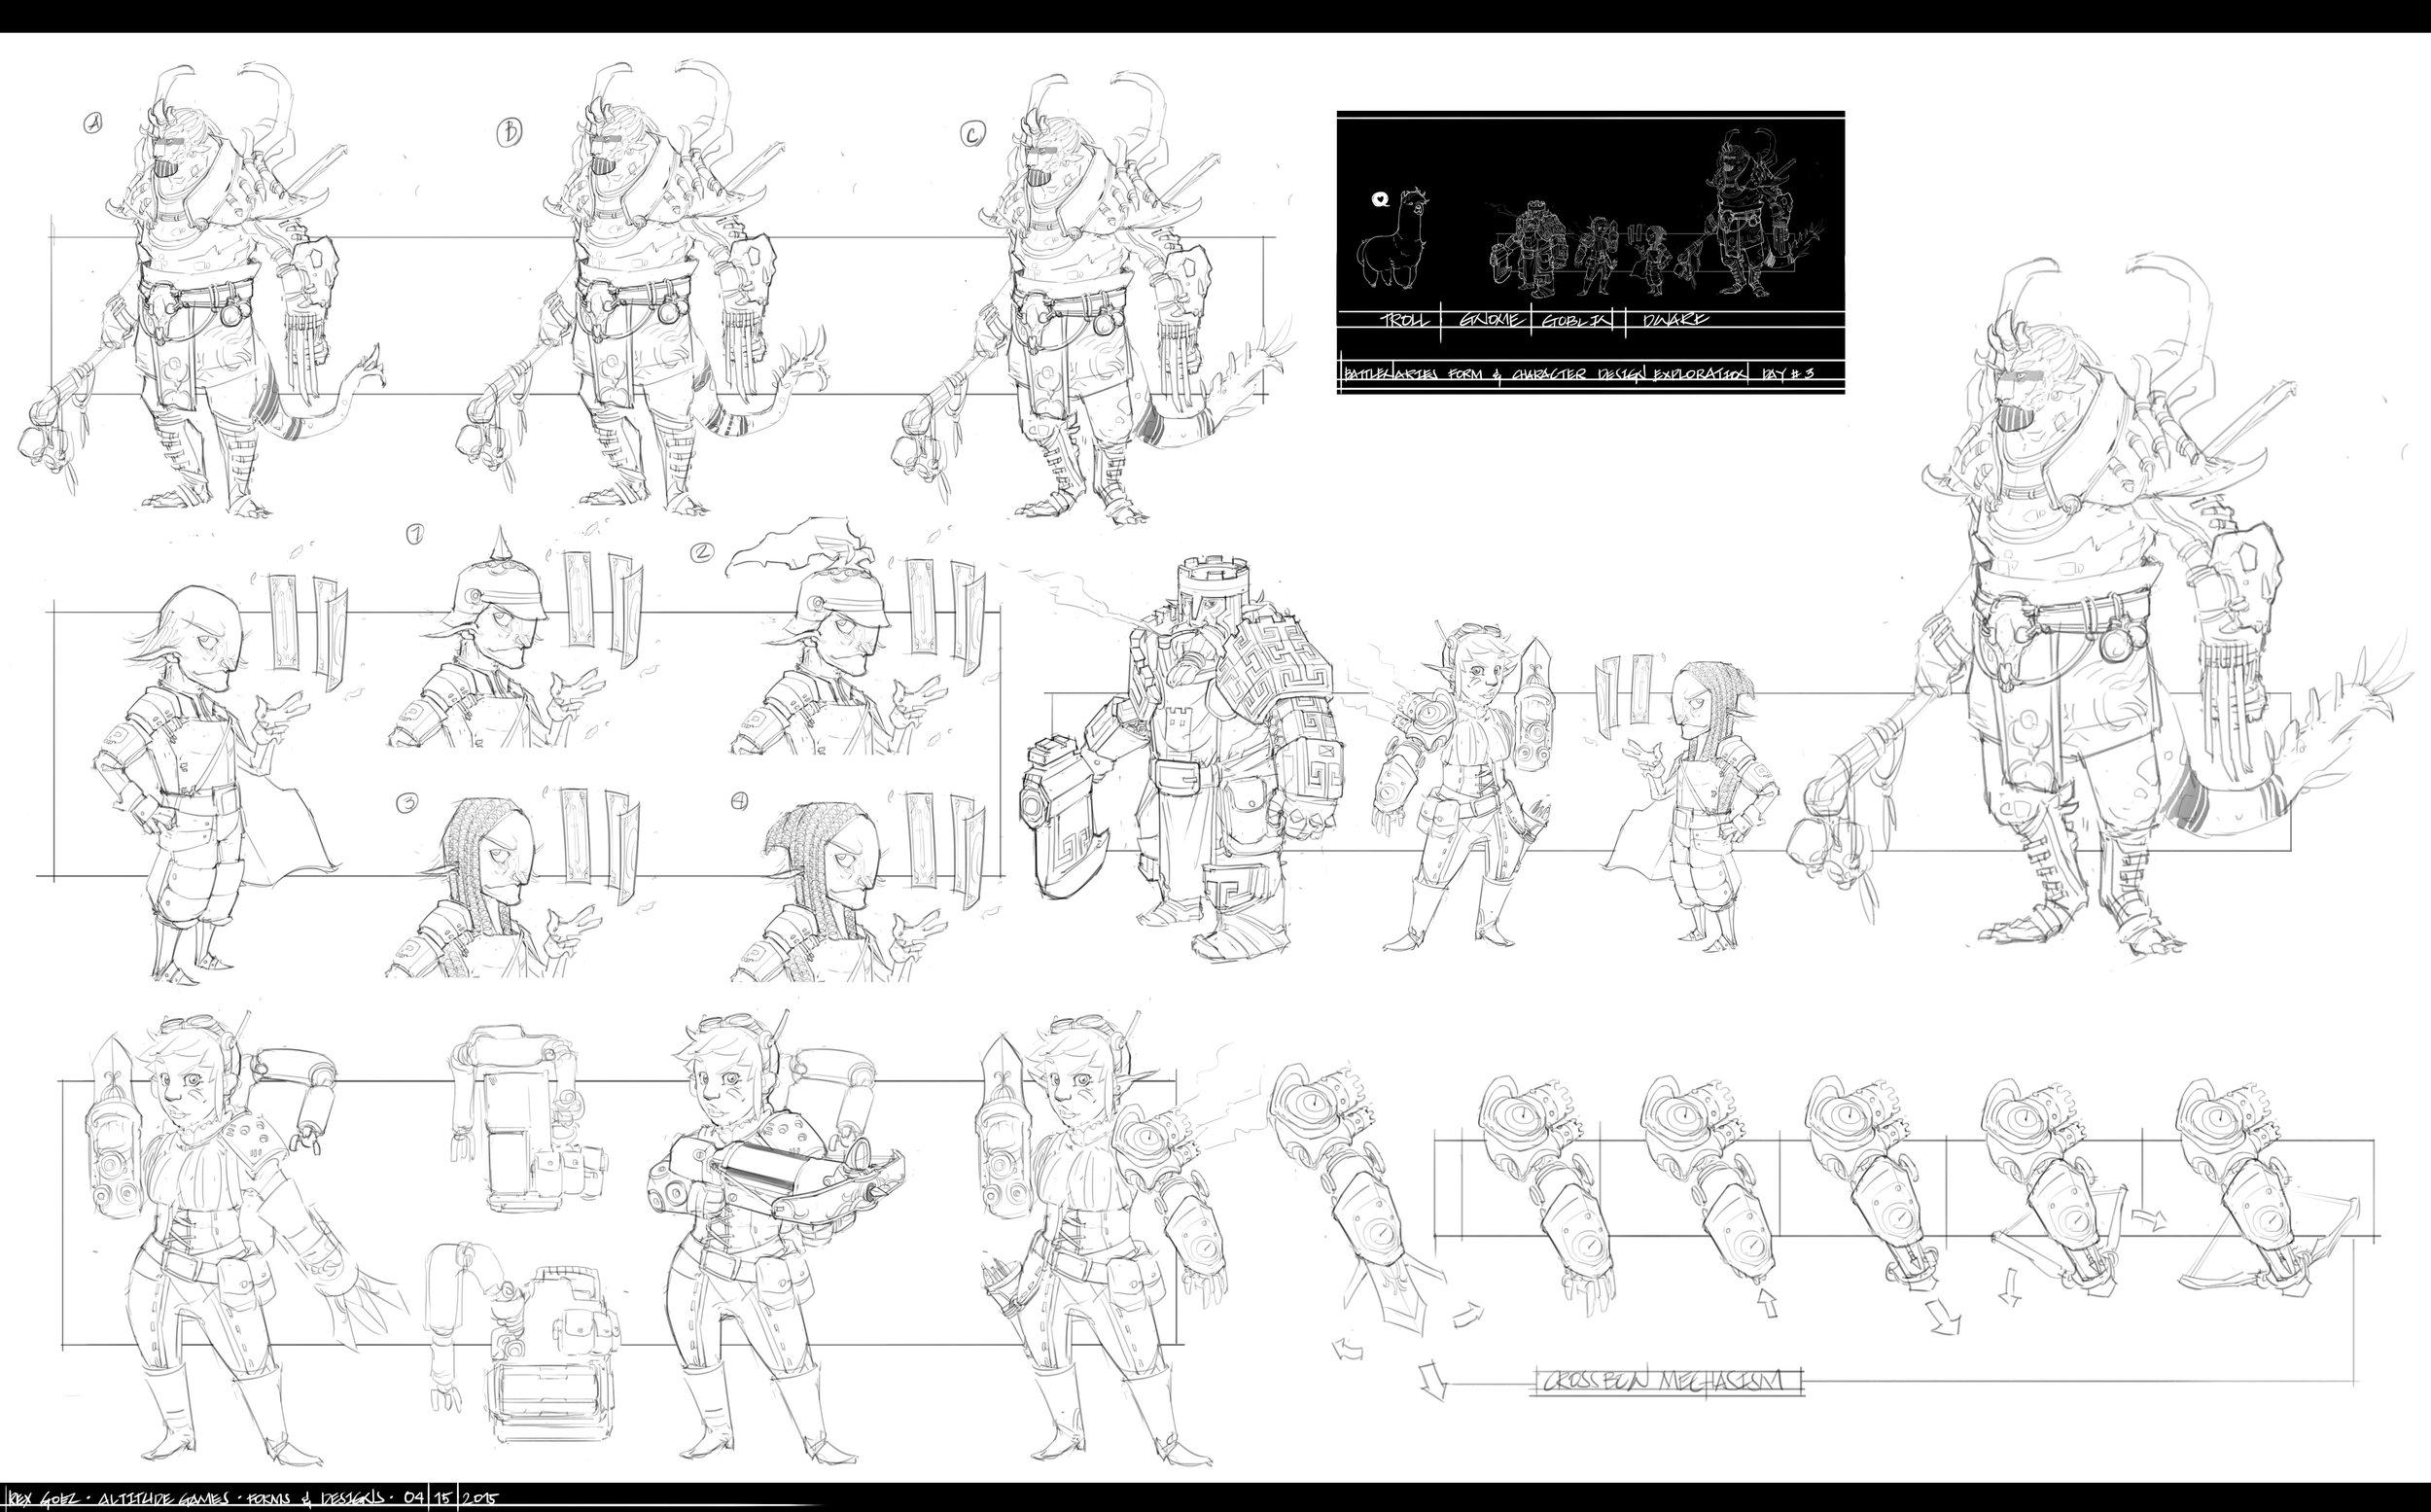 Battlenaries_Character_Designs.jpg